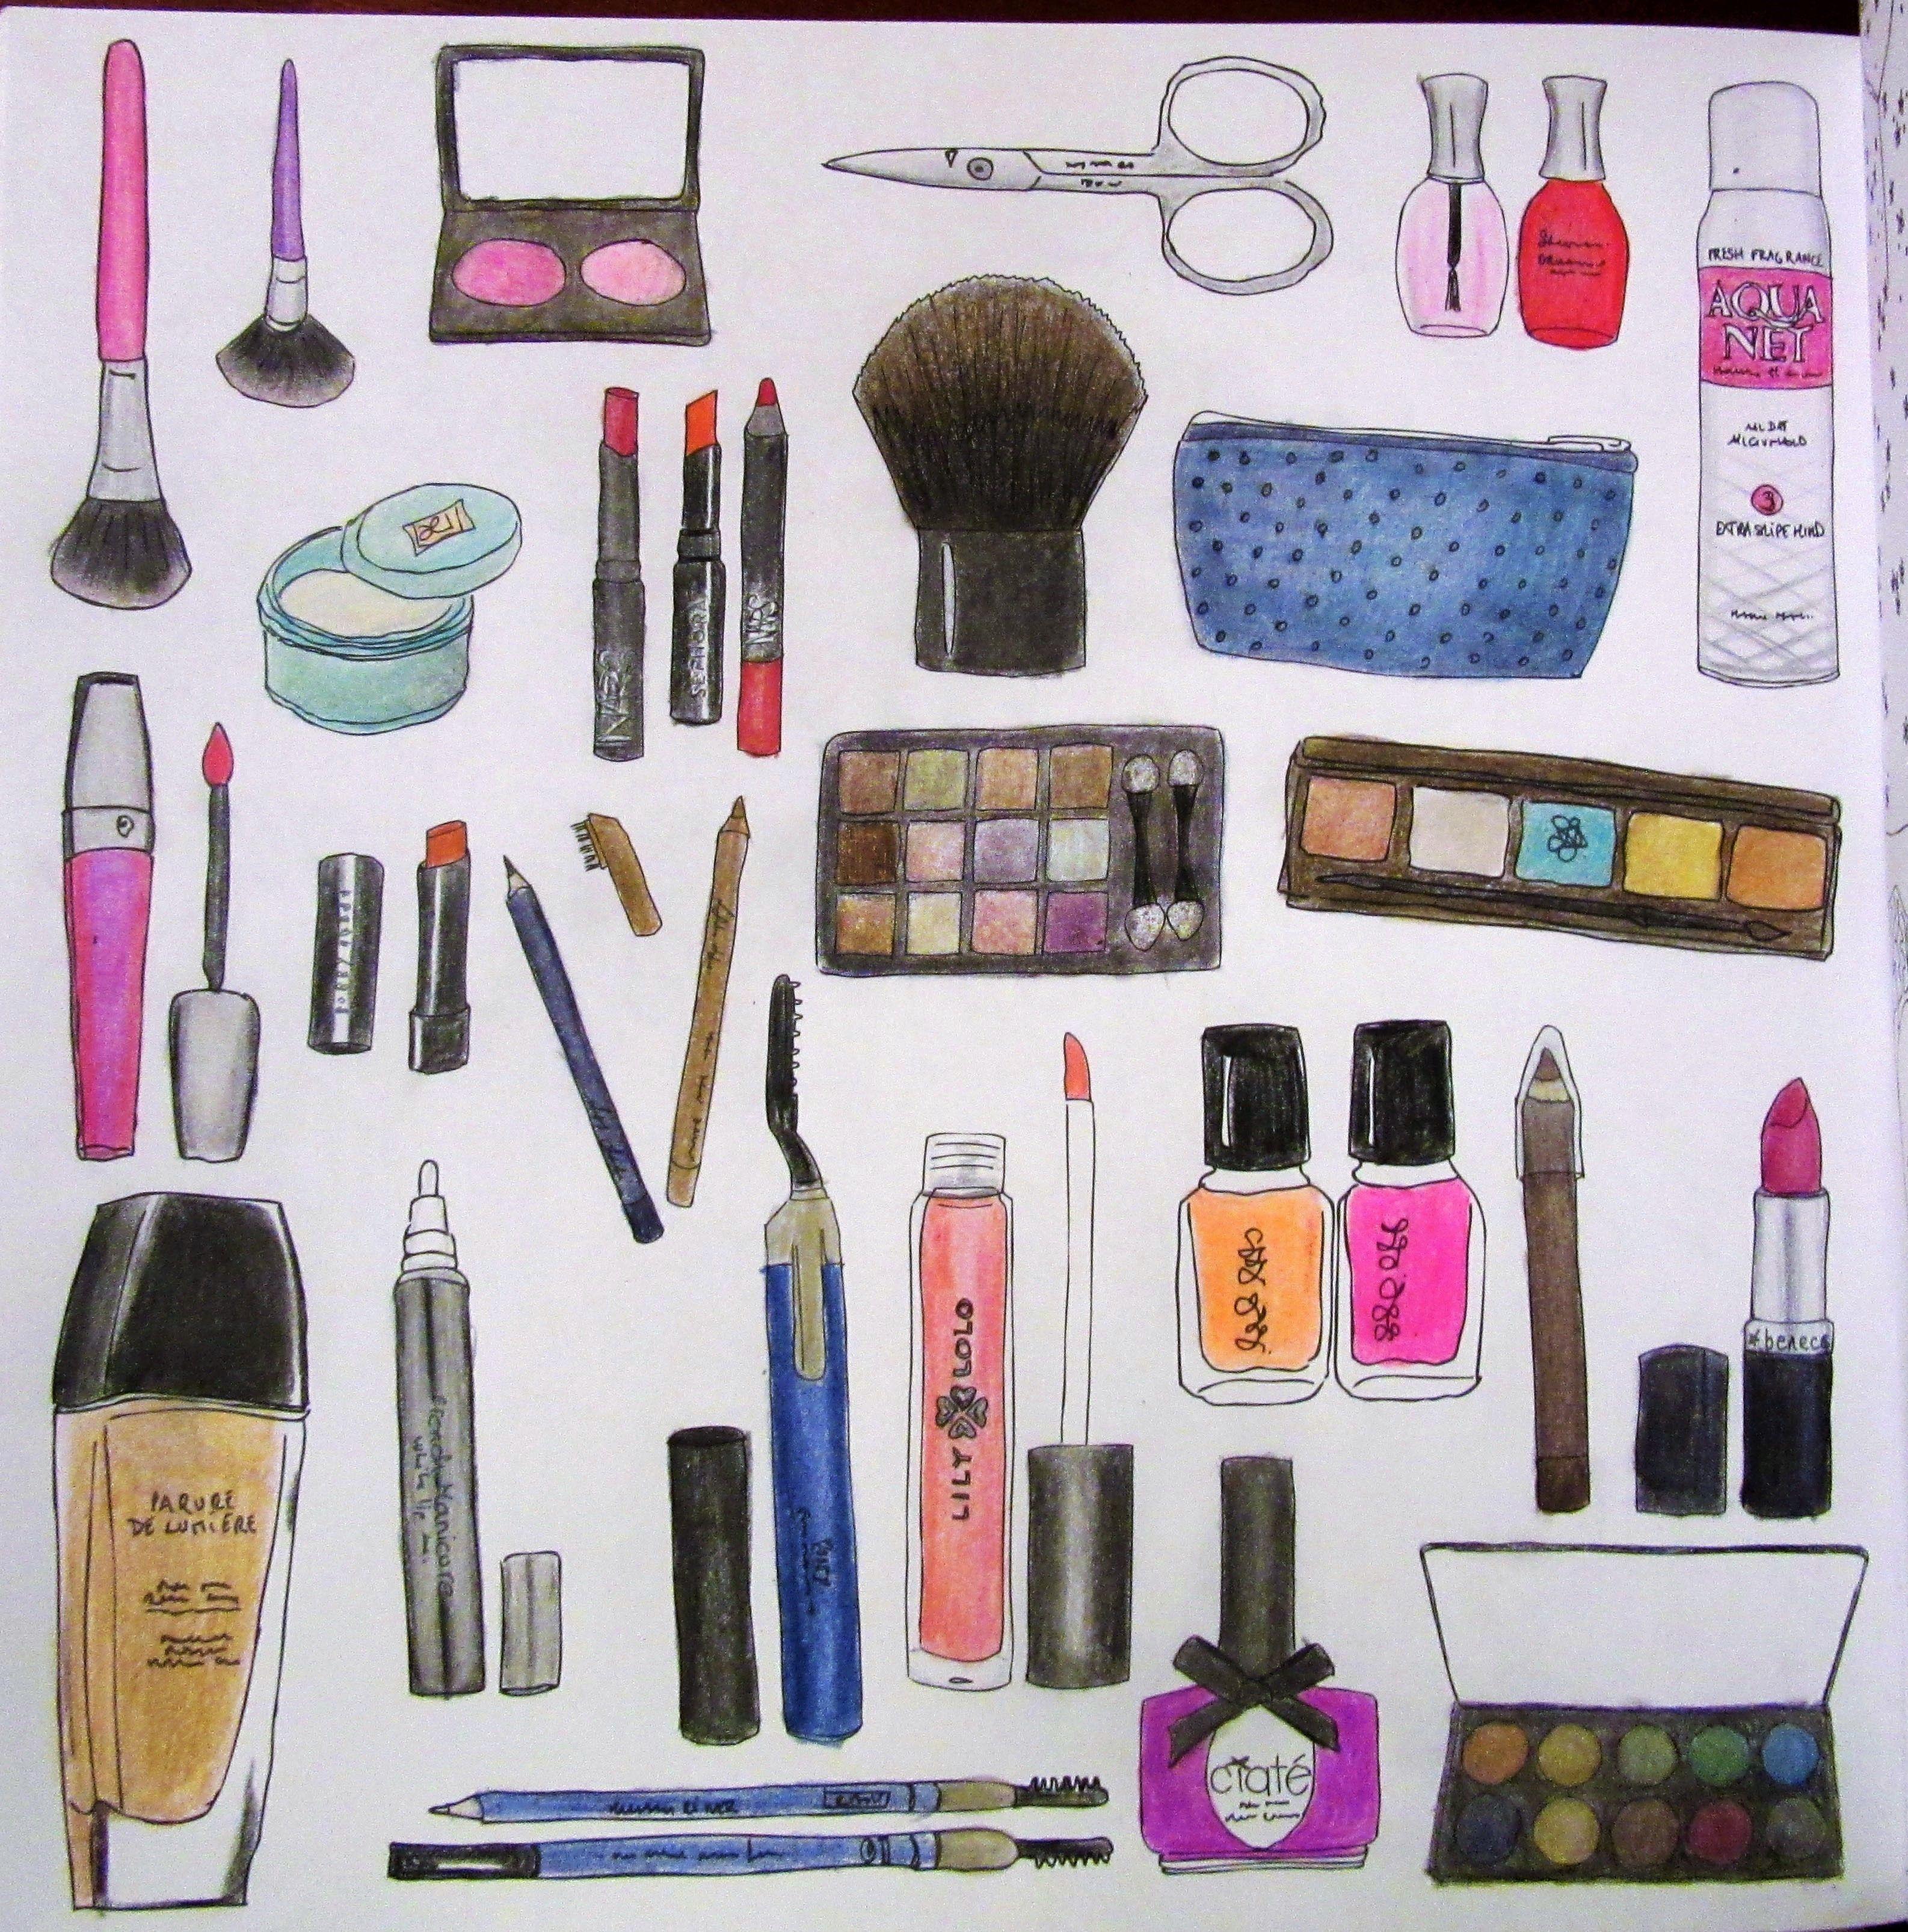 Zoe de las cases secret new york colouring book cosmetics by michelle secretparis segredode - Zoe de las cases ...